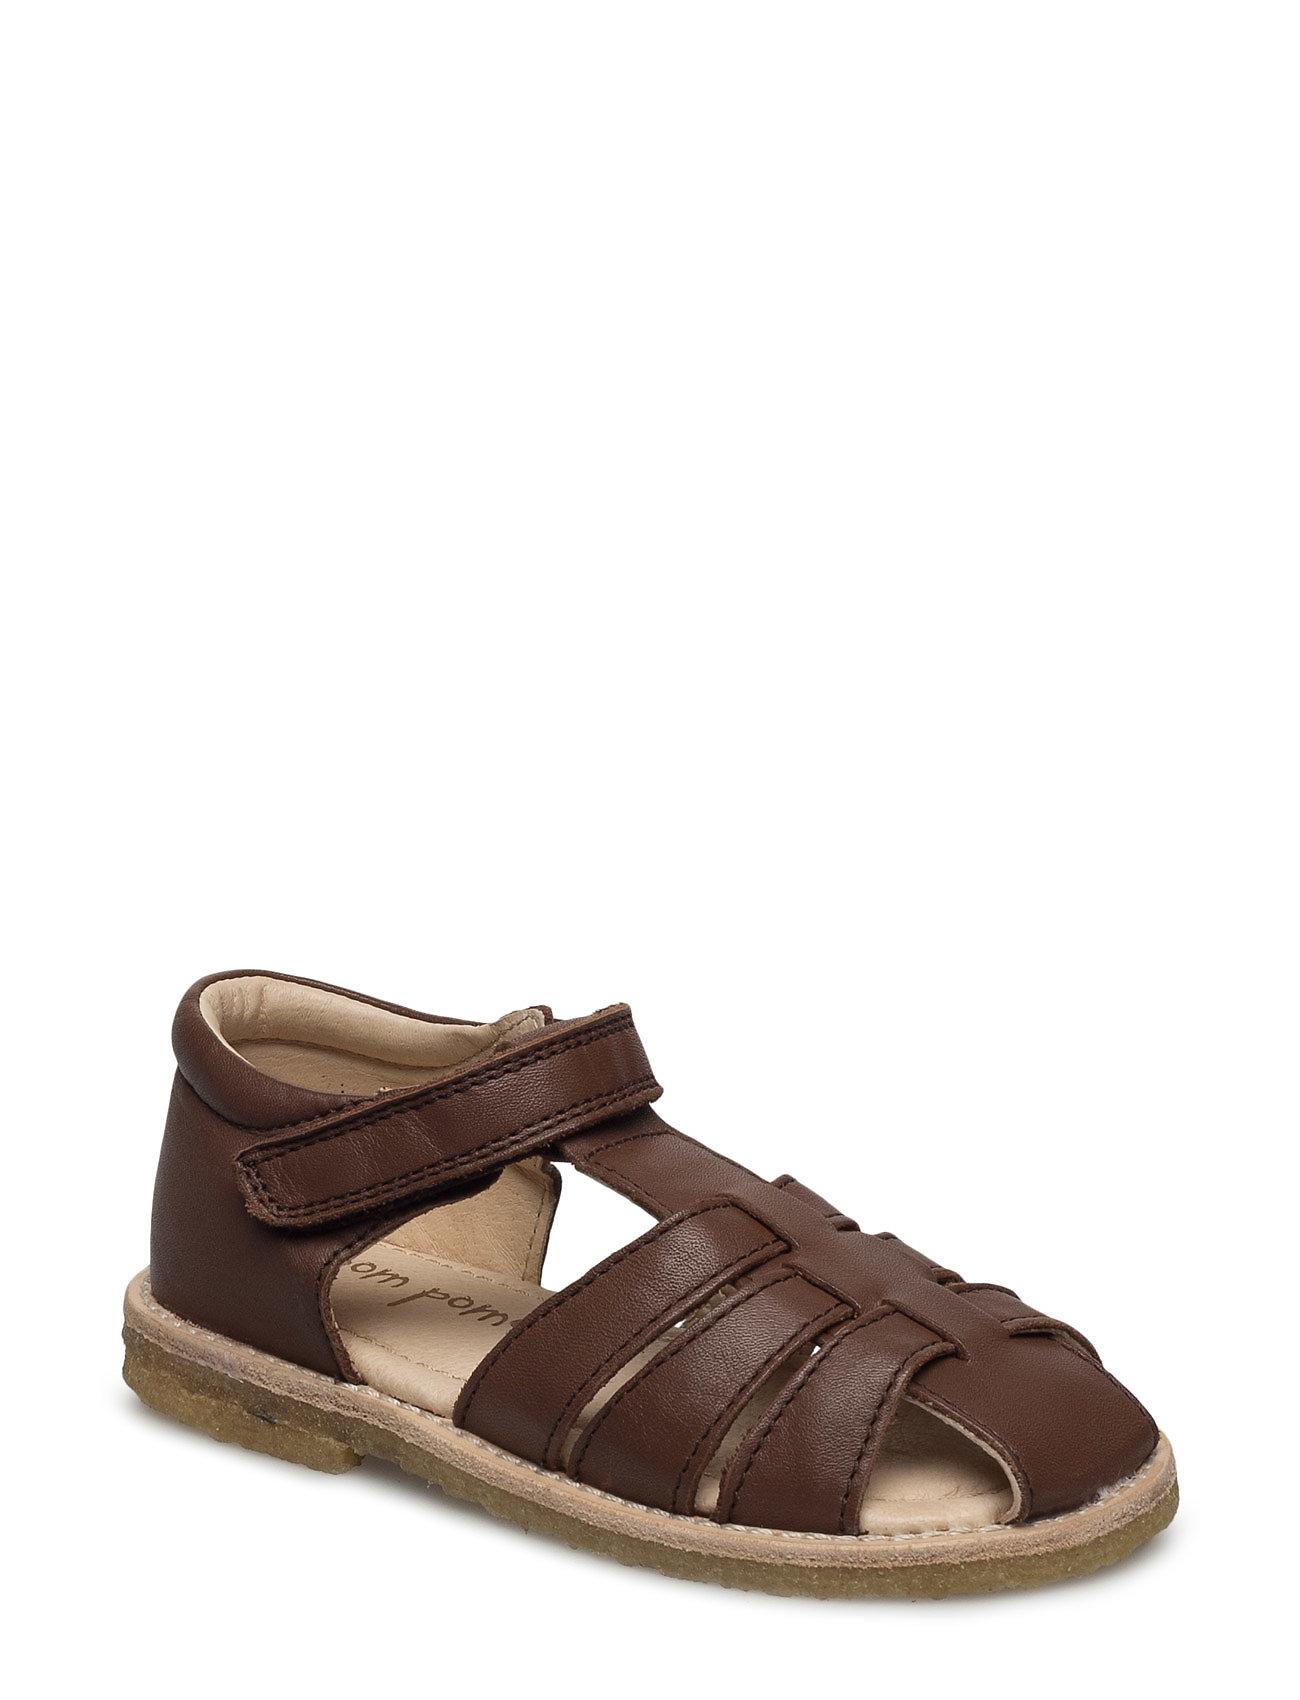 Sandal Pom pom Sandaler